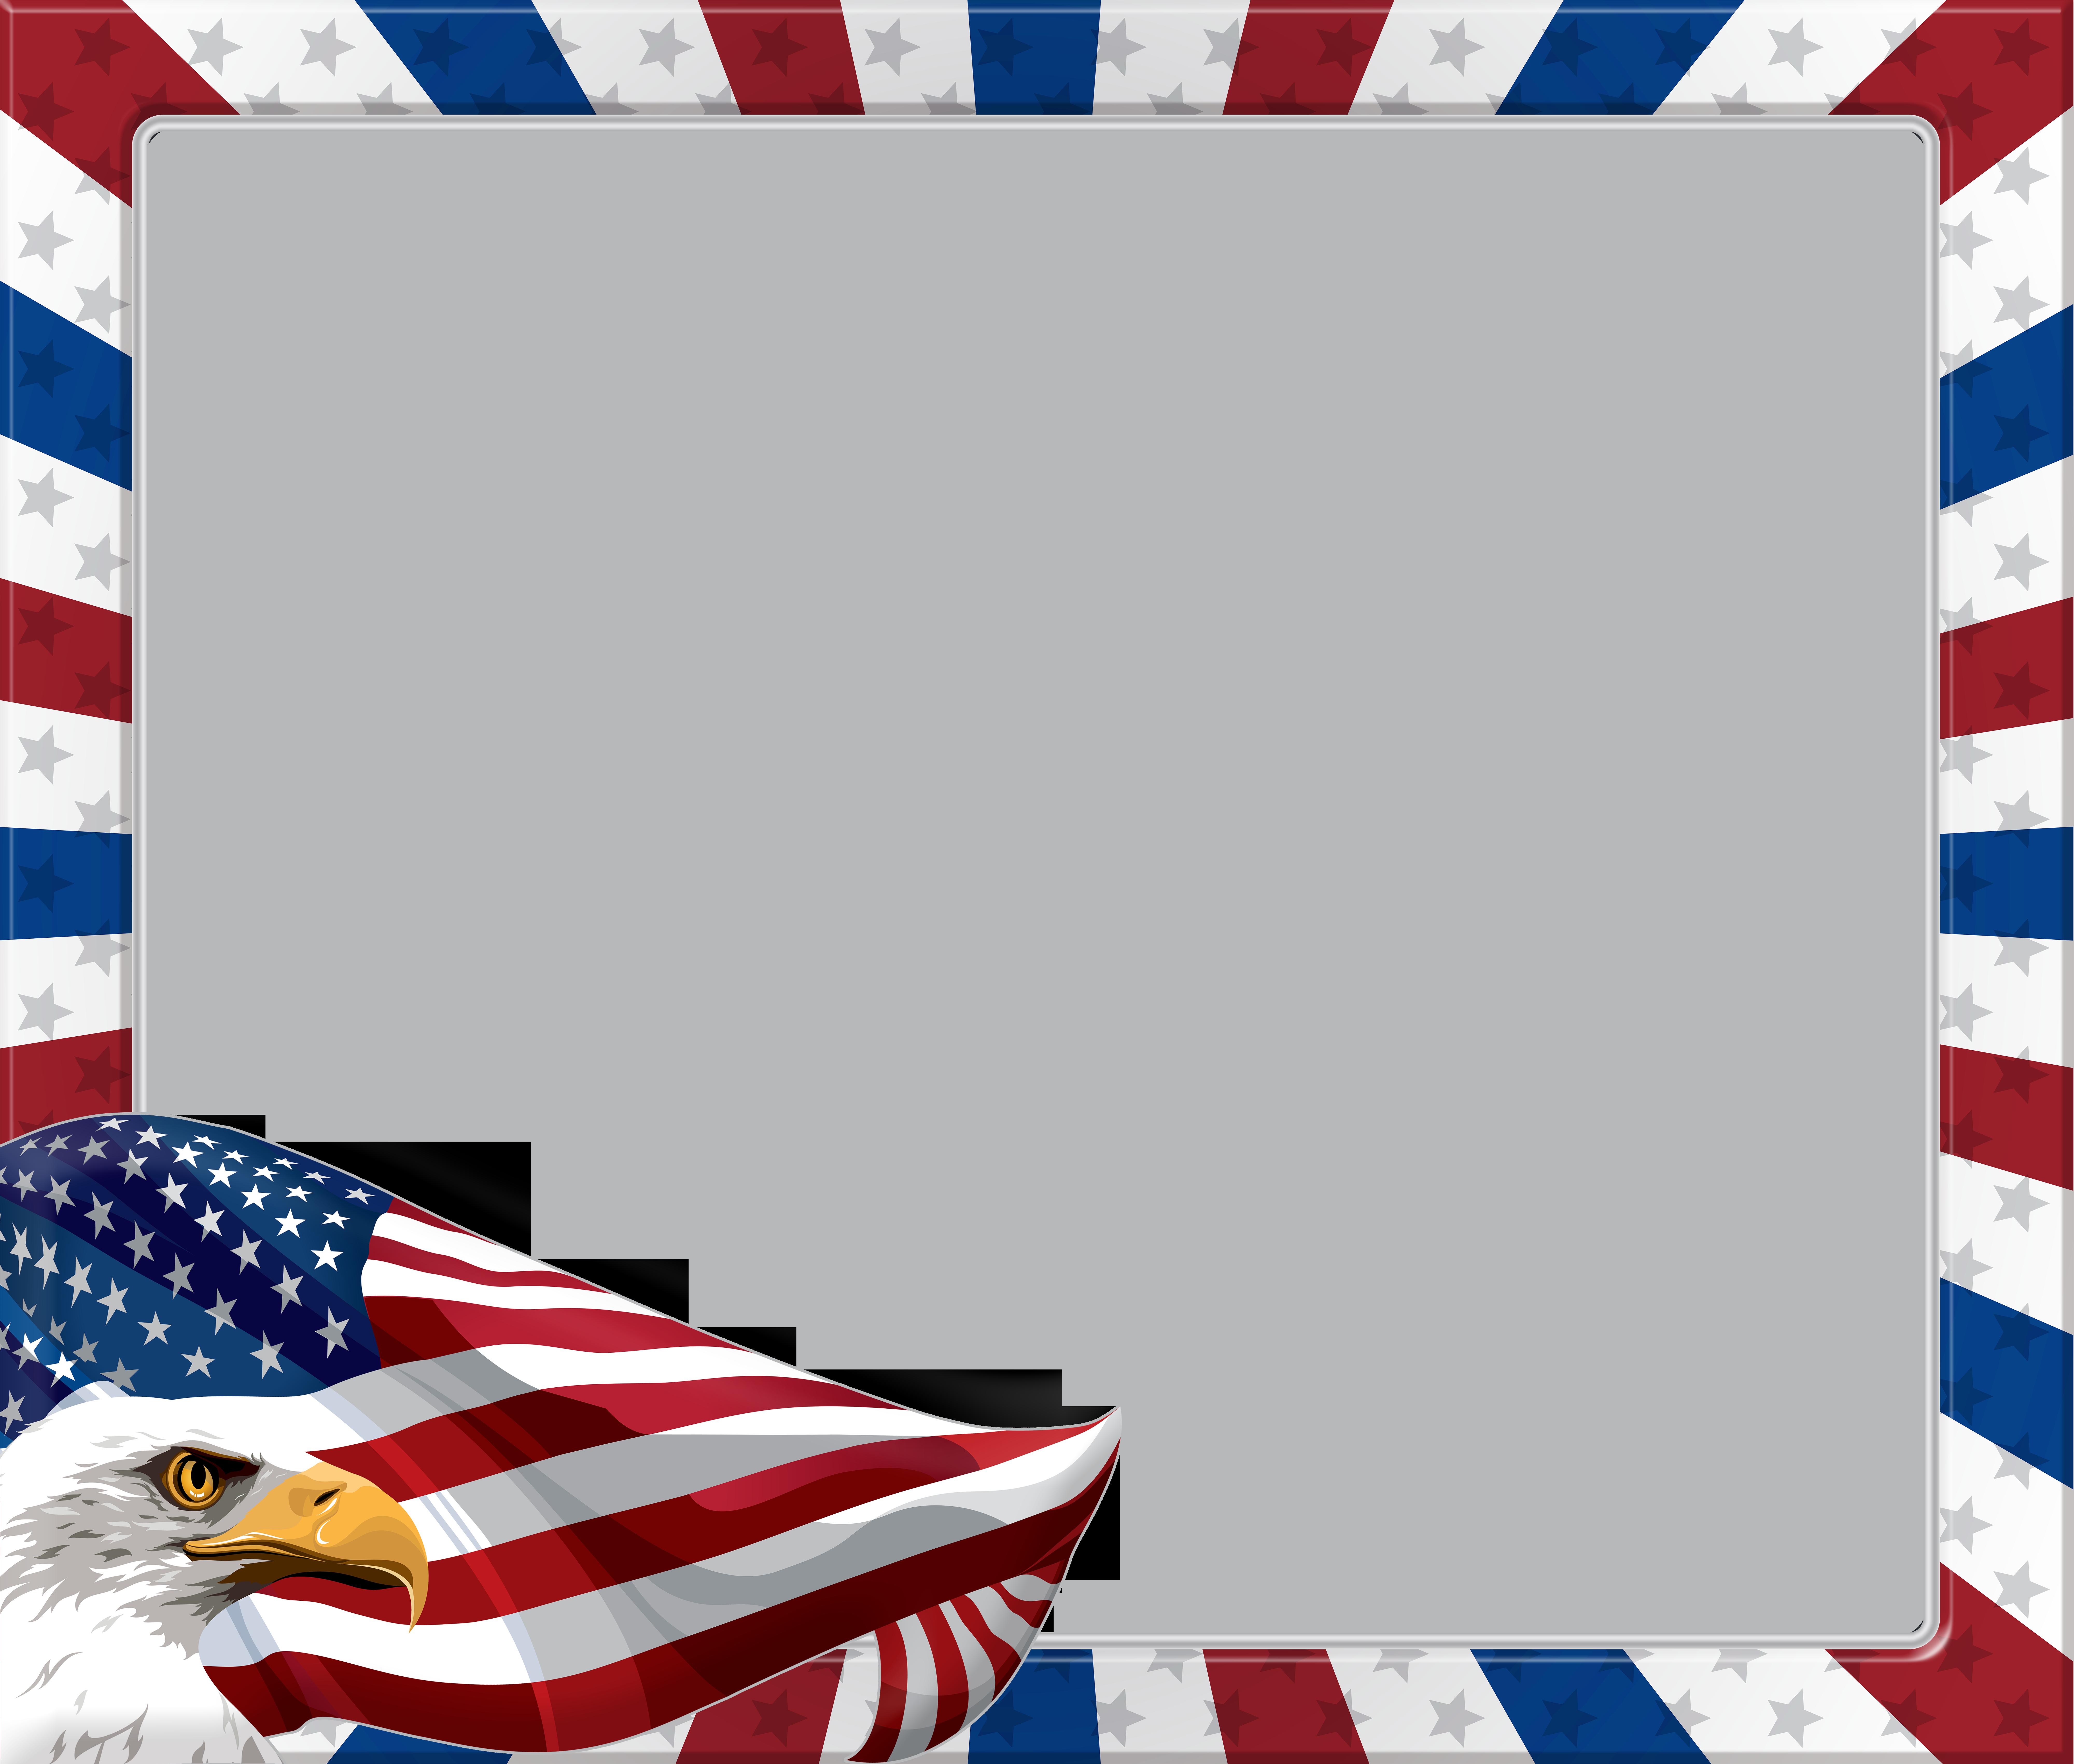 Eagle clipart frame. Usa american transparent png